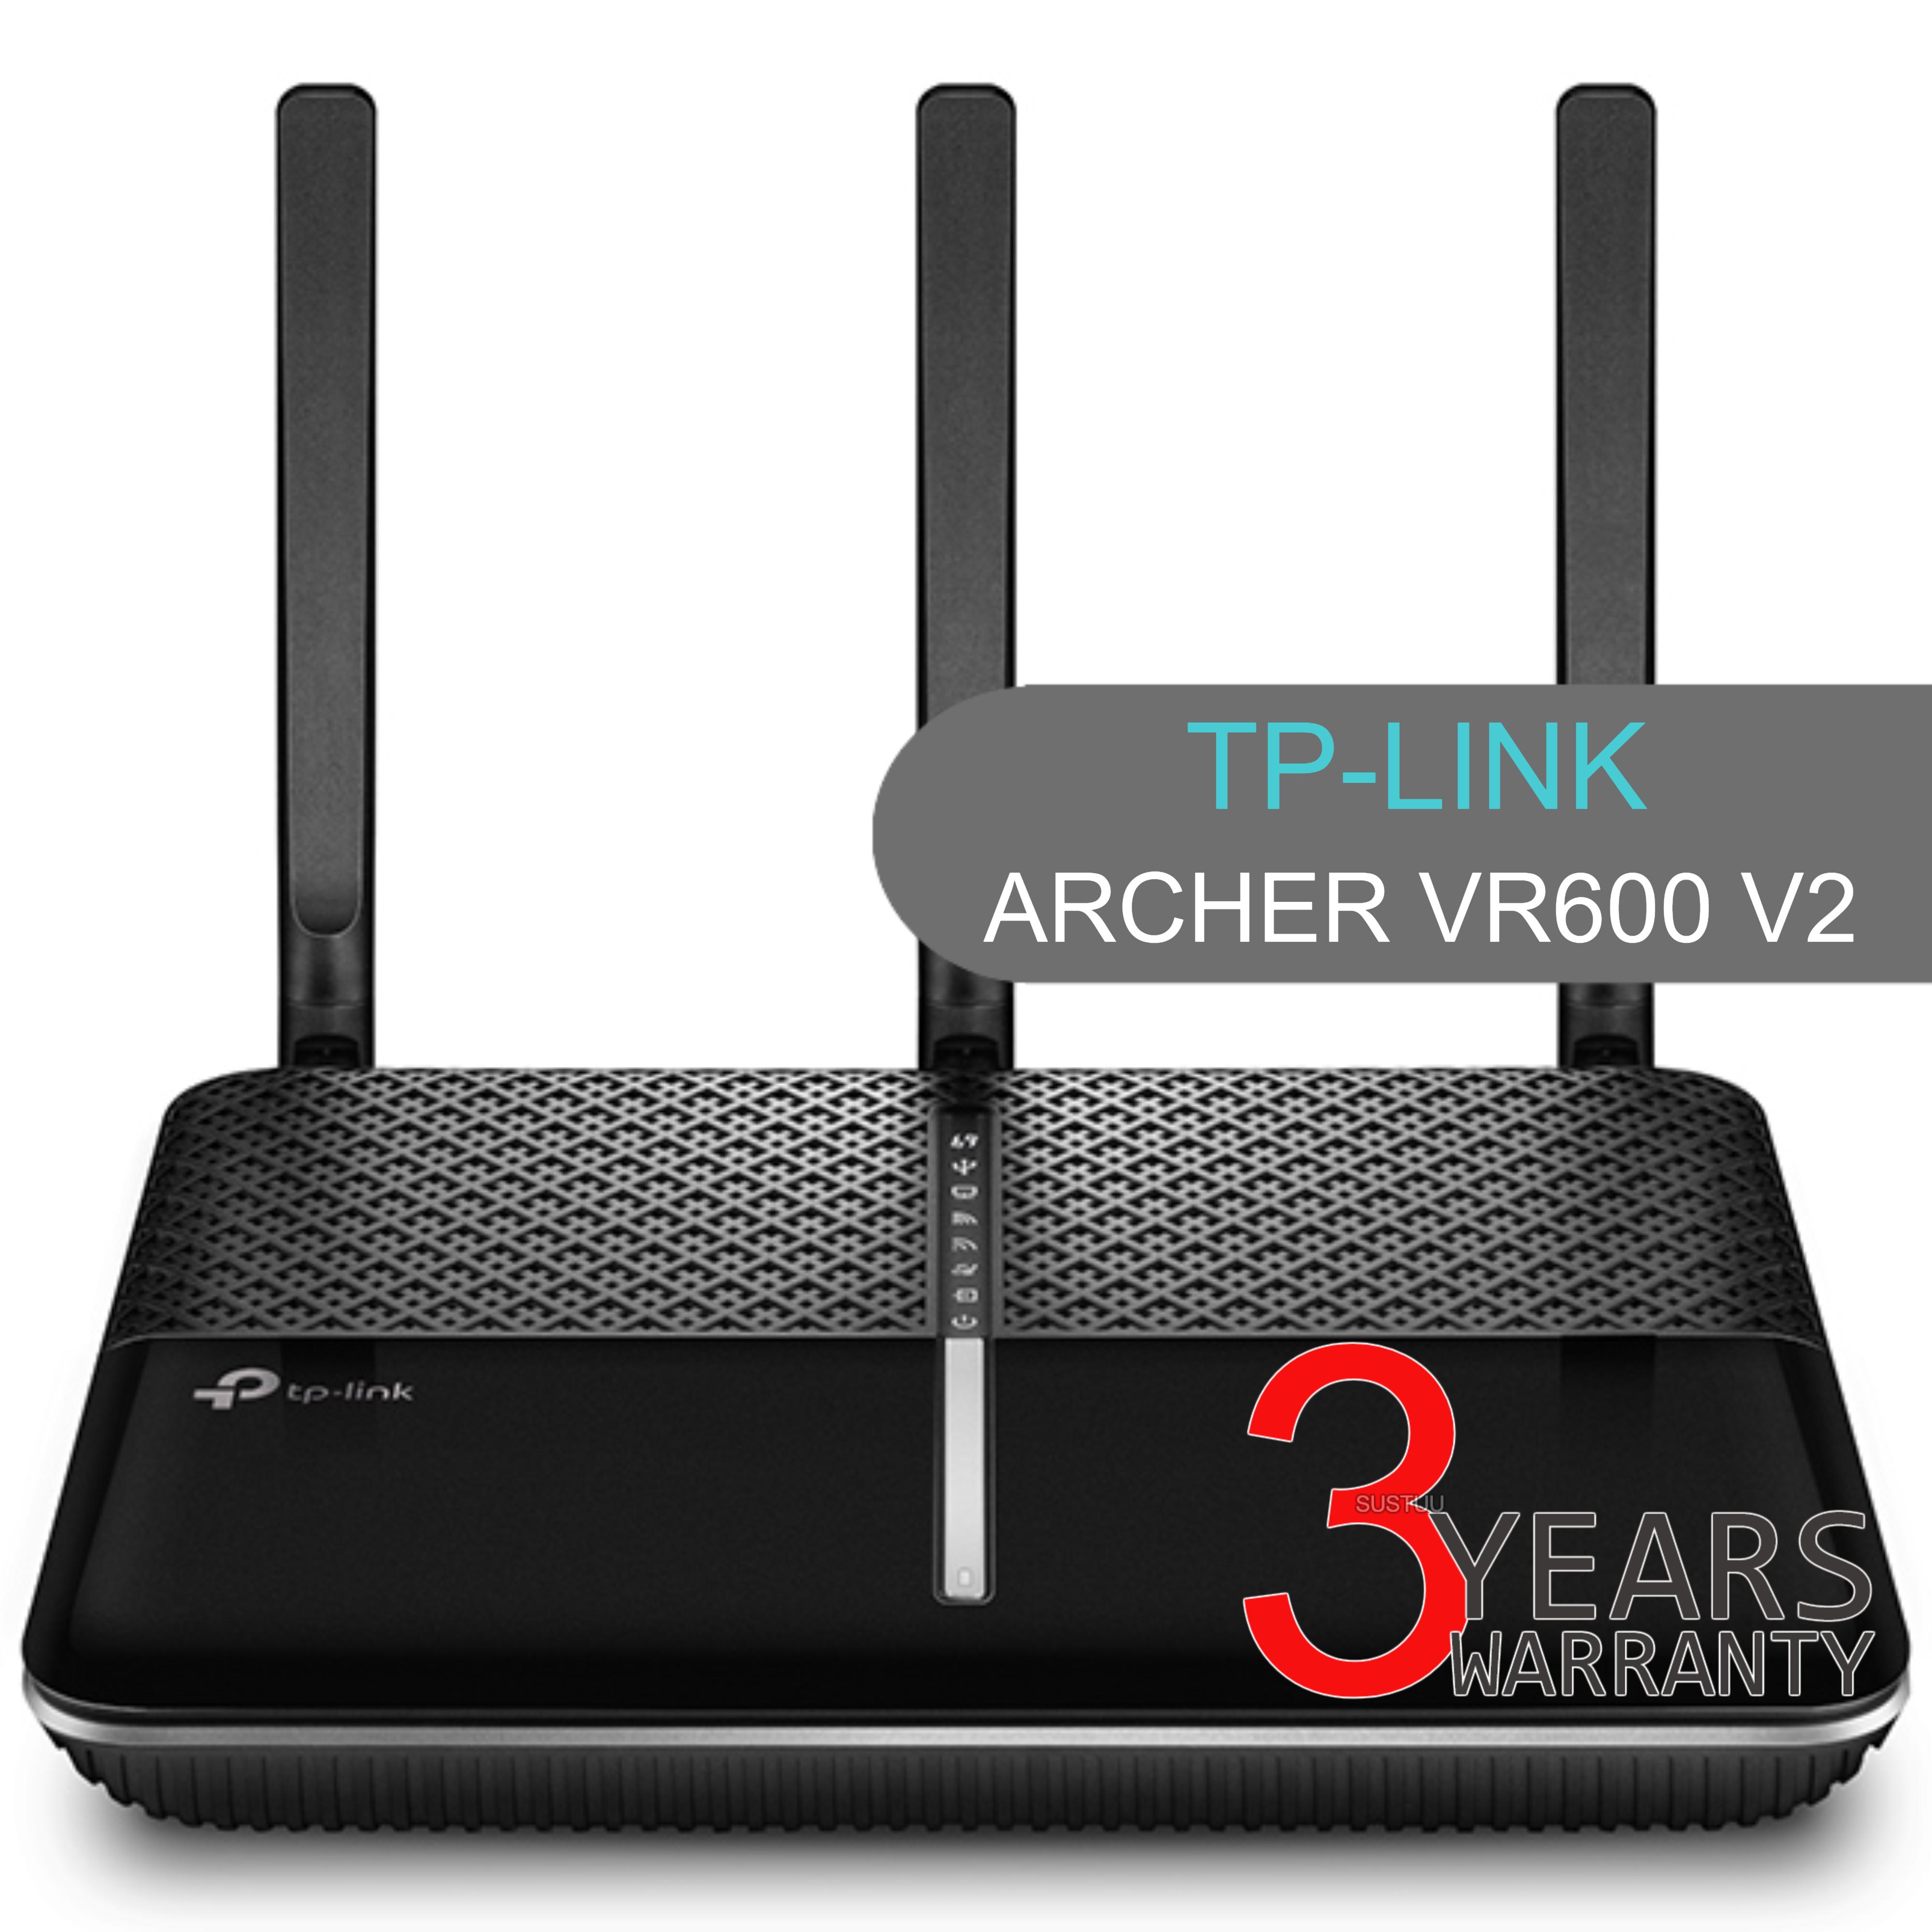 TP-Link ARCHER VR600 V2|AC1600 Wireless Gigabit VDSL/ADSL Modem Router|1.6Gbps Wi-Fi